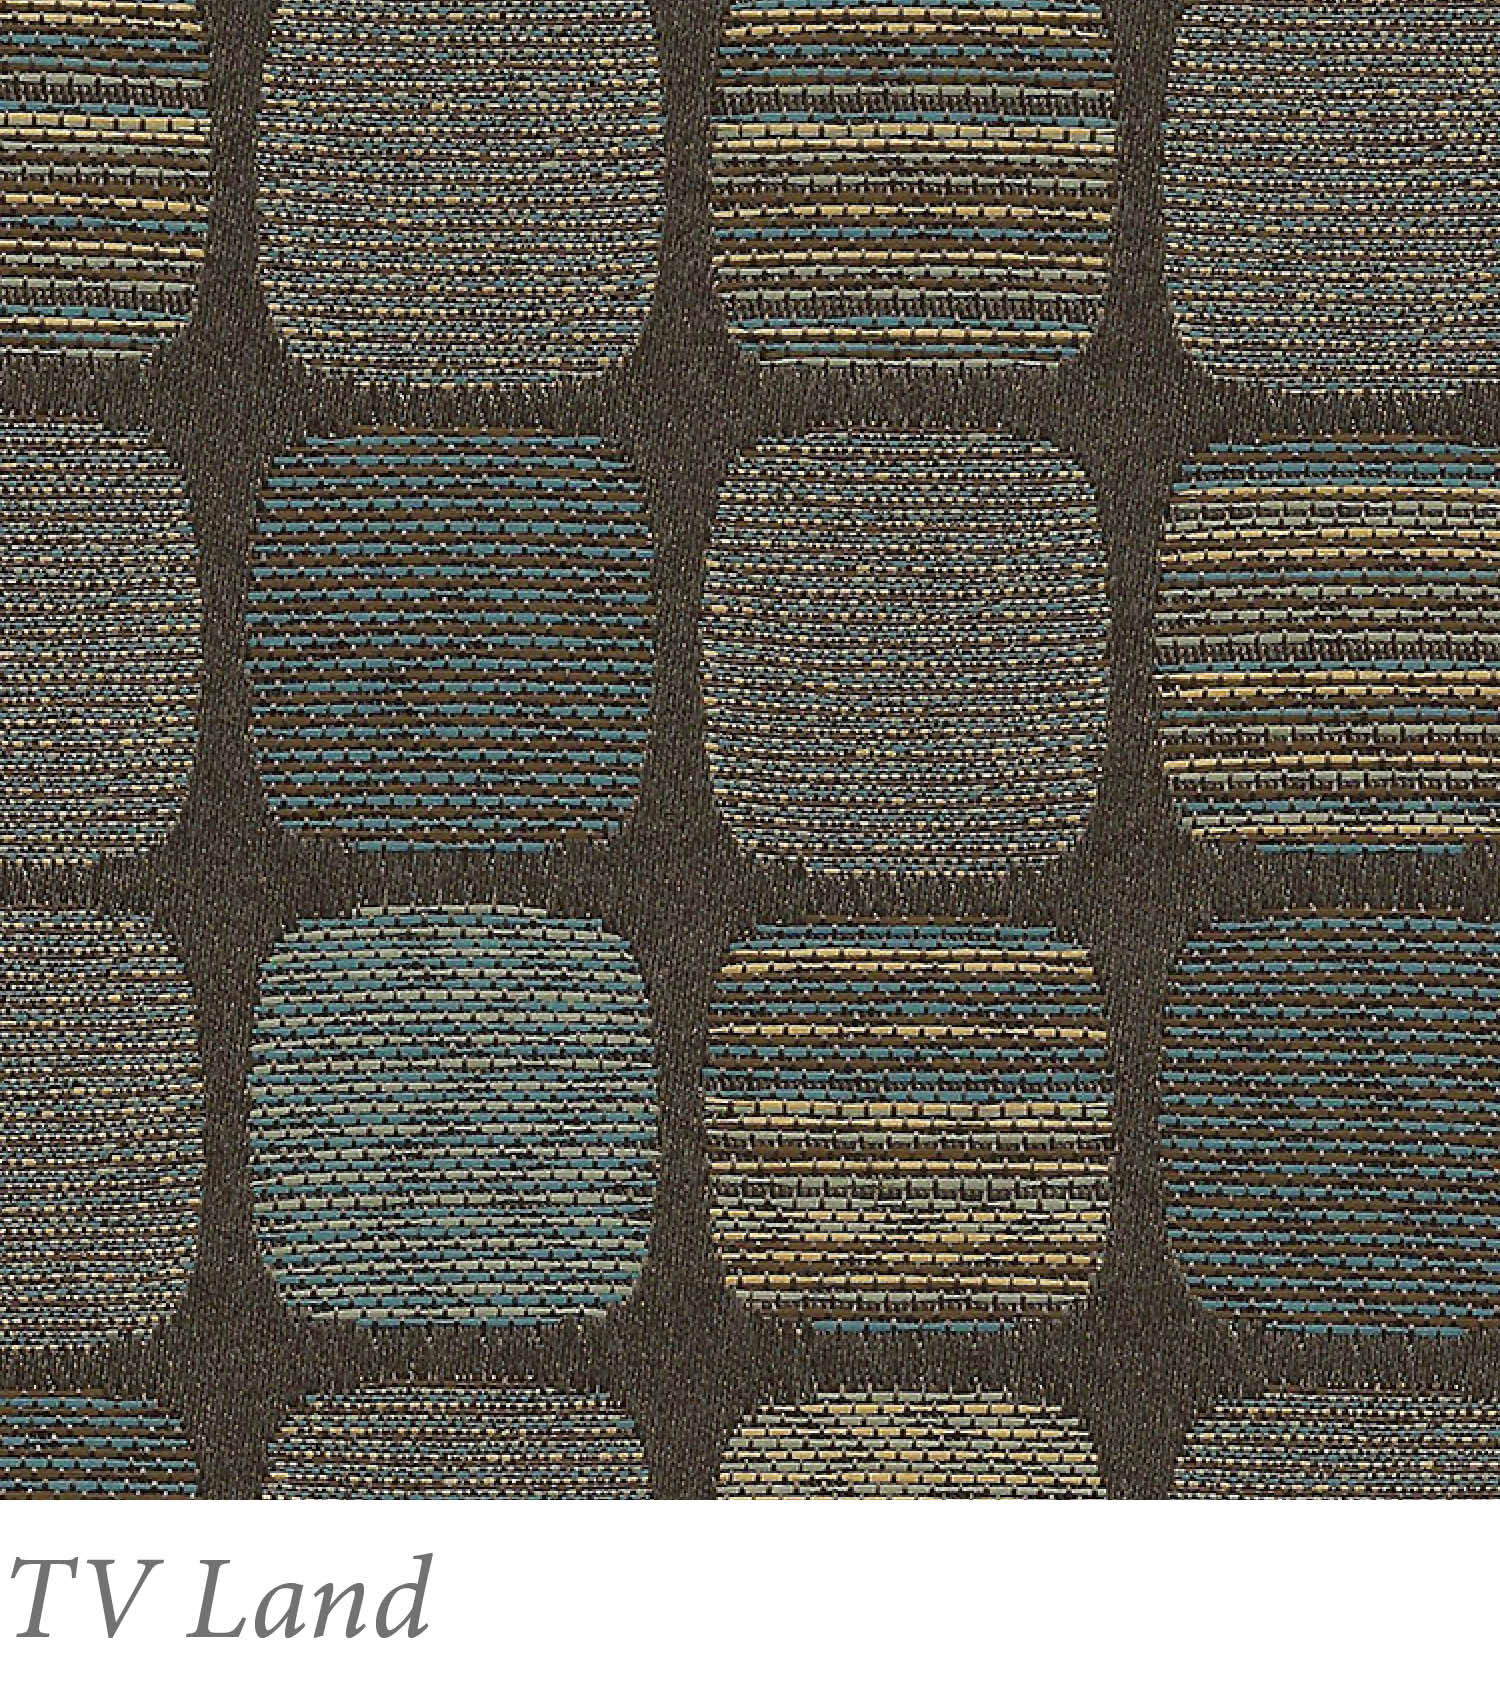 TV Land.jpg